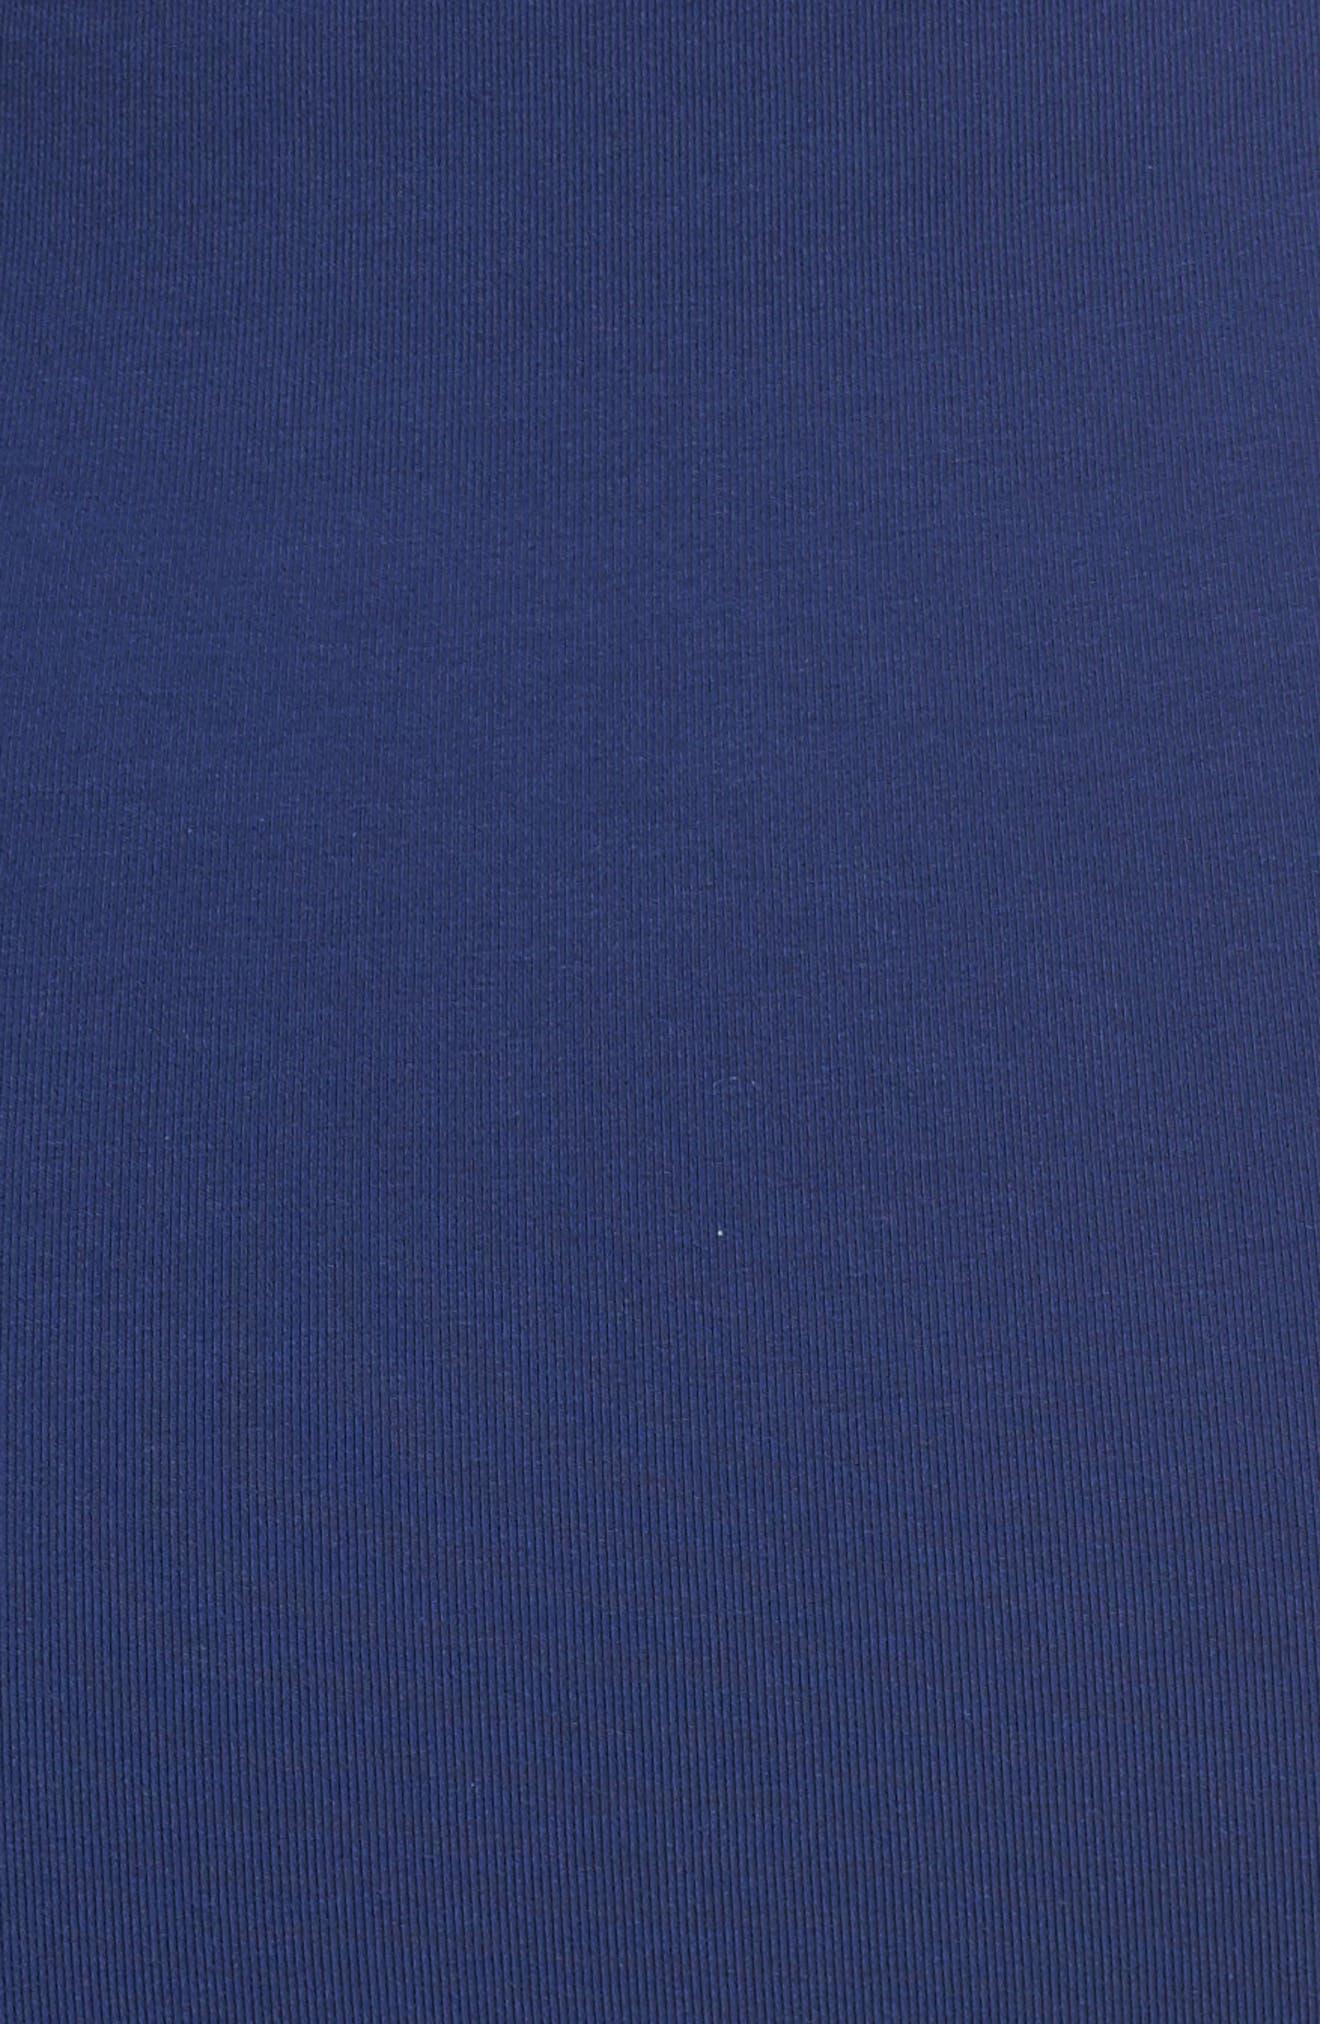 T7 Sweatshirt Dress,                             Alternate thumbnail 6, color,                             400